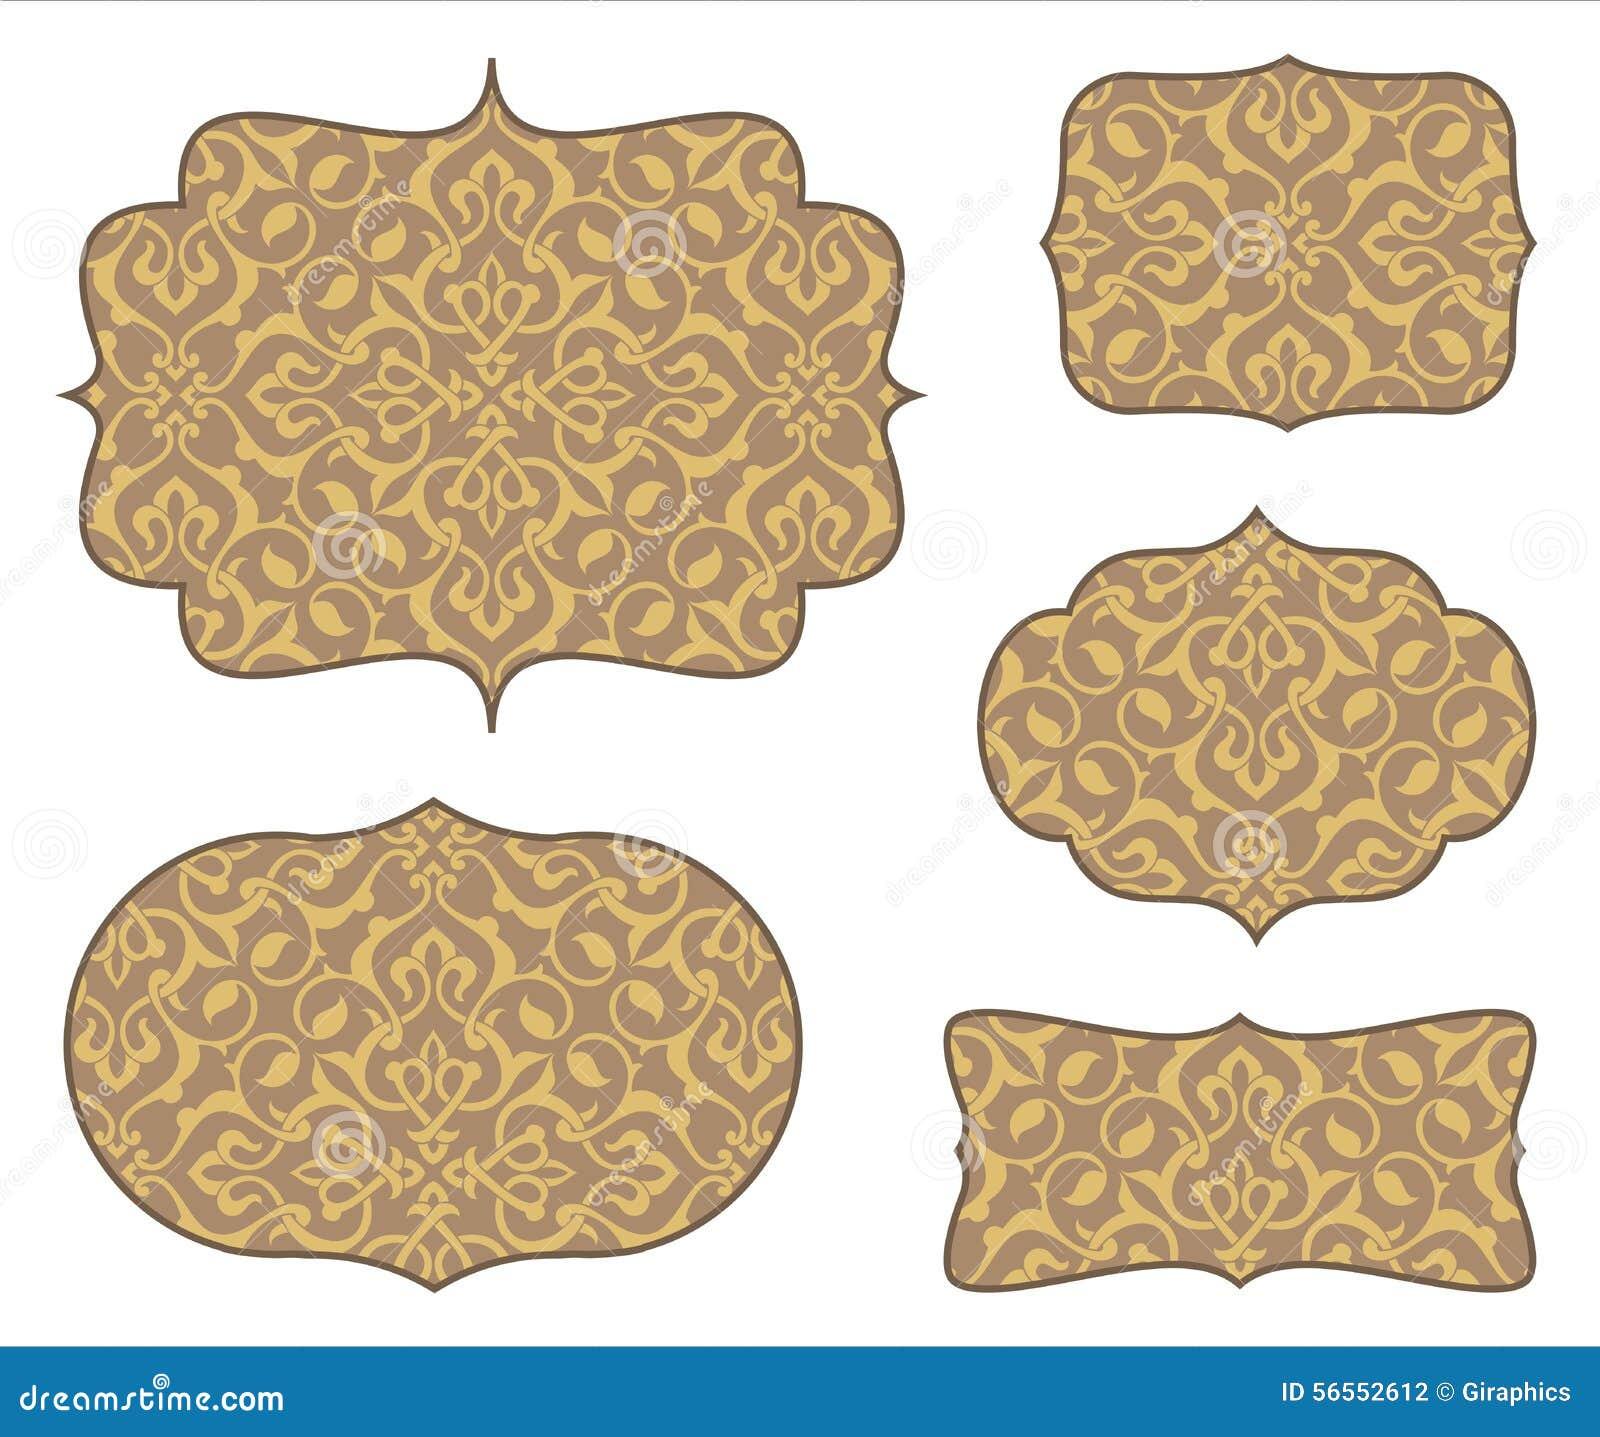 Download Πλαίσια Arabesque με το άνευ ραφής σχέδιο Διανυσματική απεικόνιση - εικονογραφία από αναδρομικός, διακόσμηση: 56552612